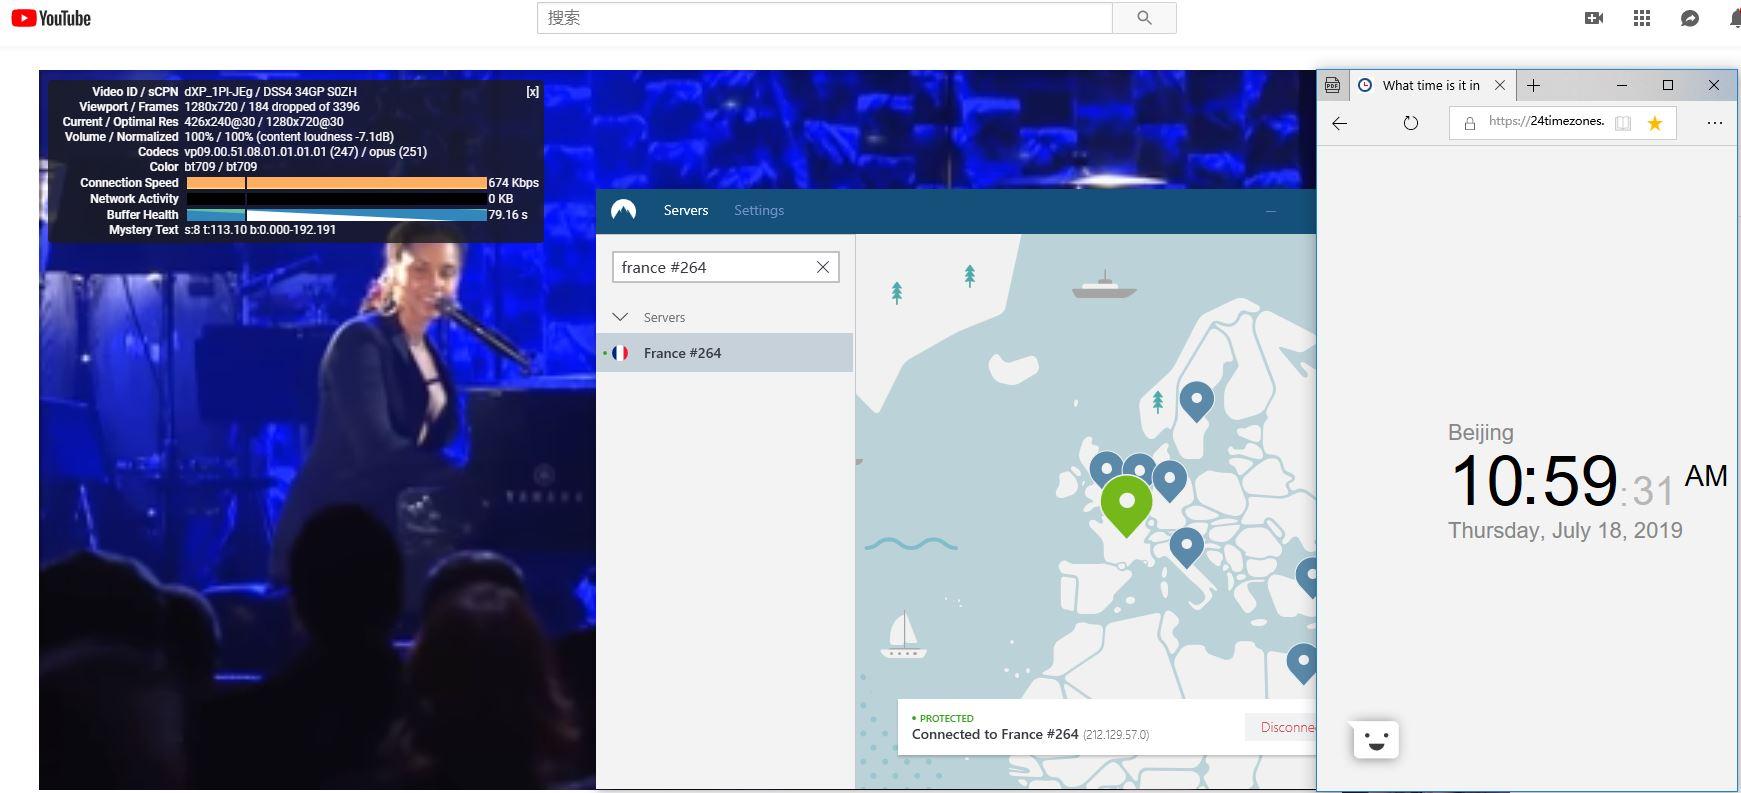 NordVPN Windows 翻墙 科学上午 法国-264服务器 YouTube速度测试-20190718